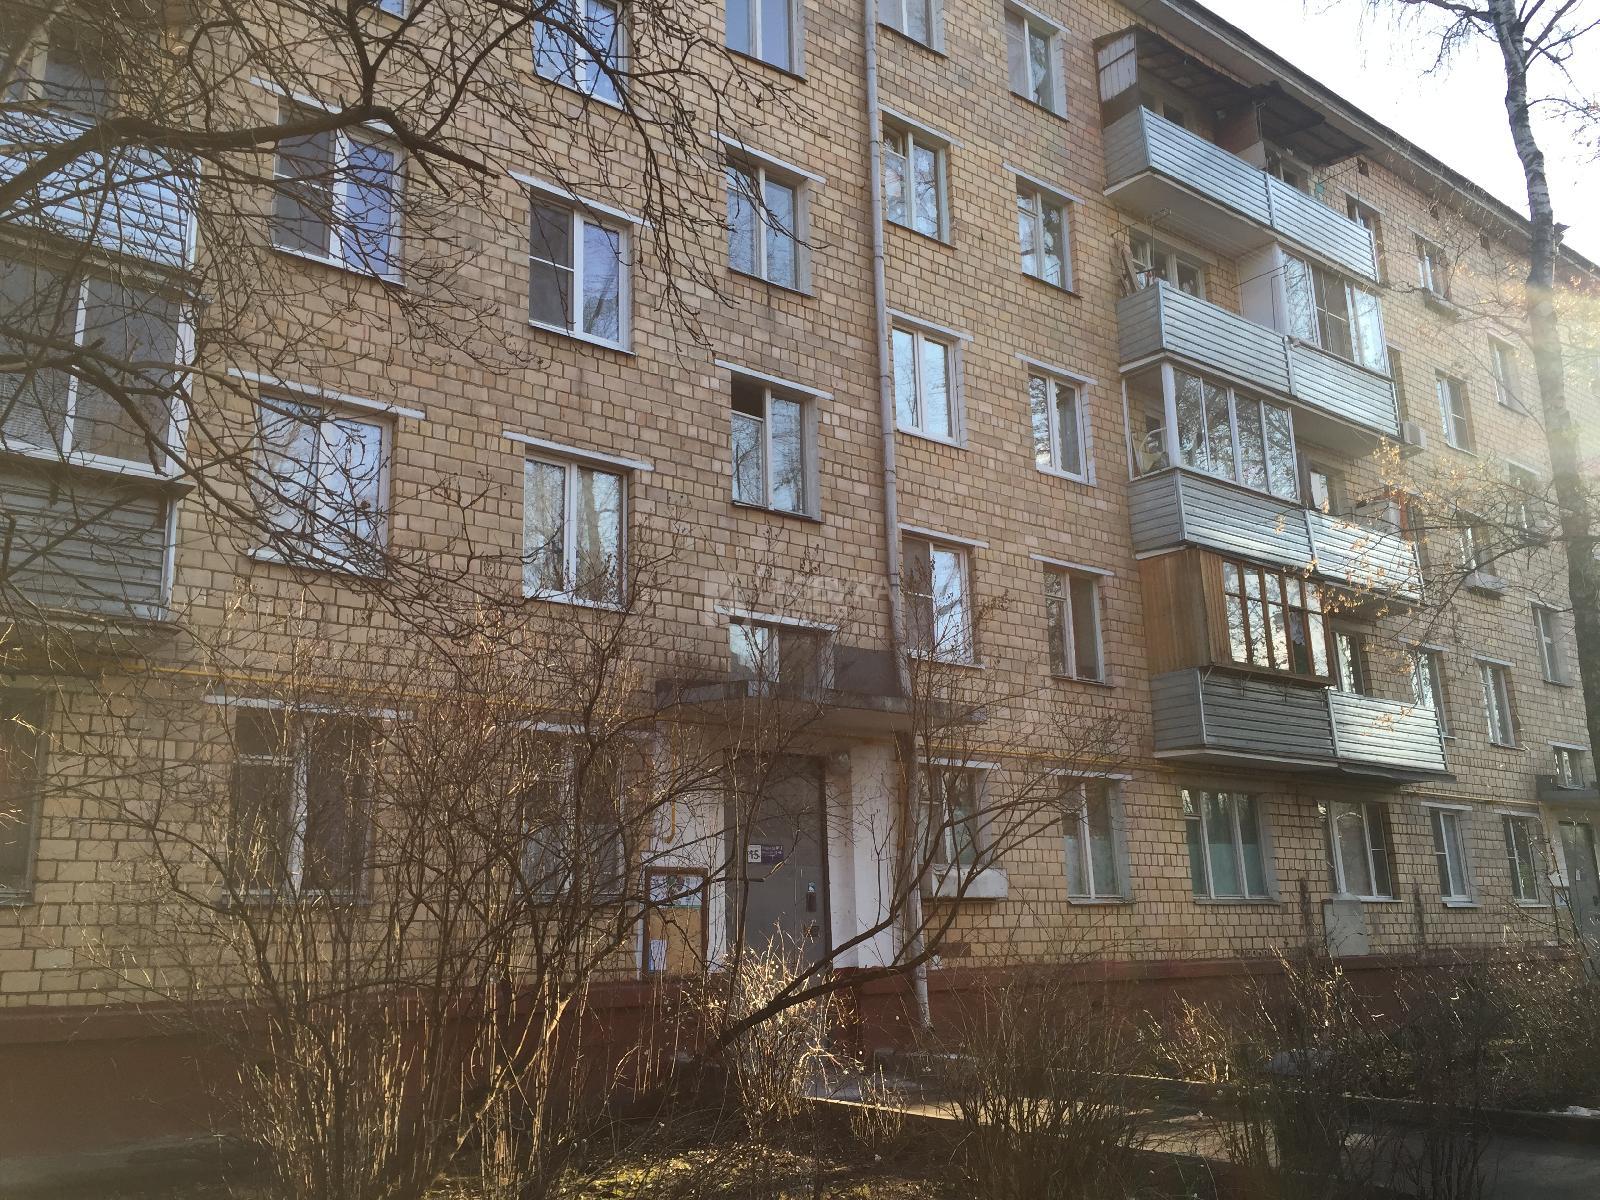 Фото №4 - 3-комнатная квартира, Москва, Криворожская улица 15, метро Нагорная